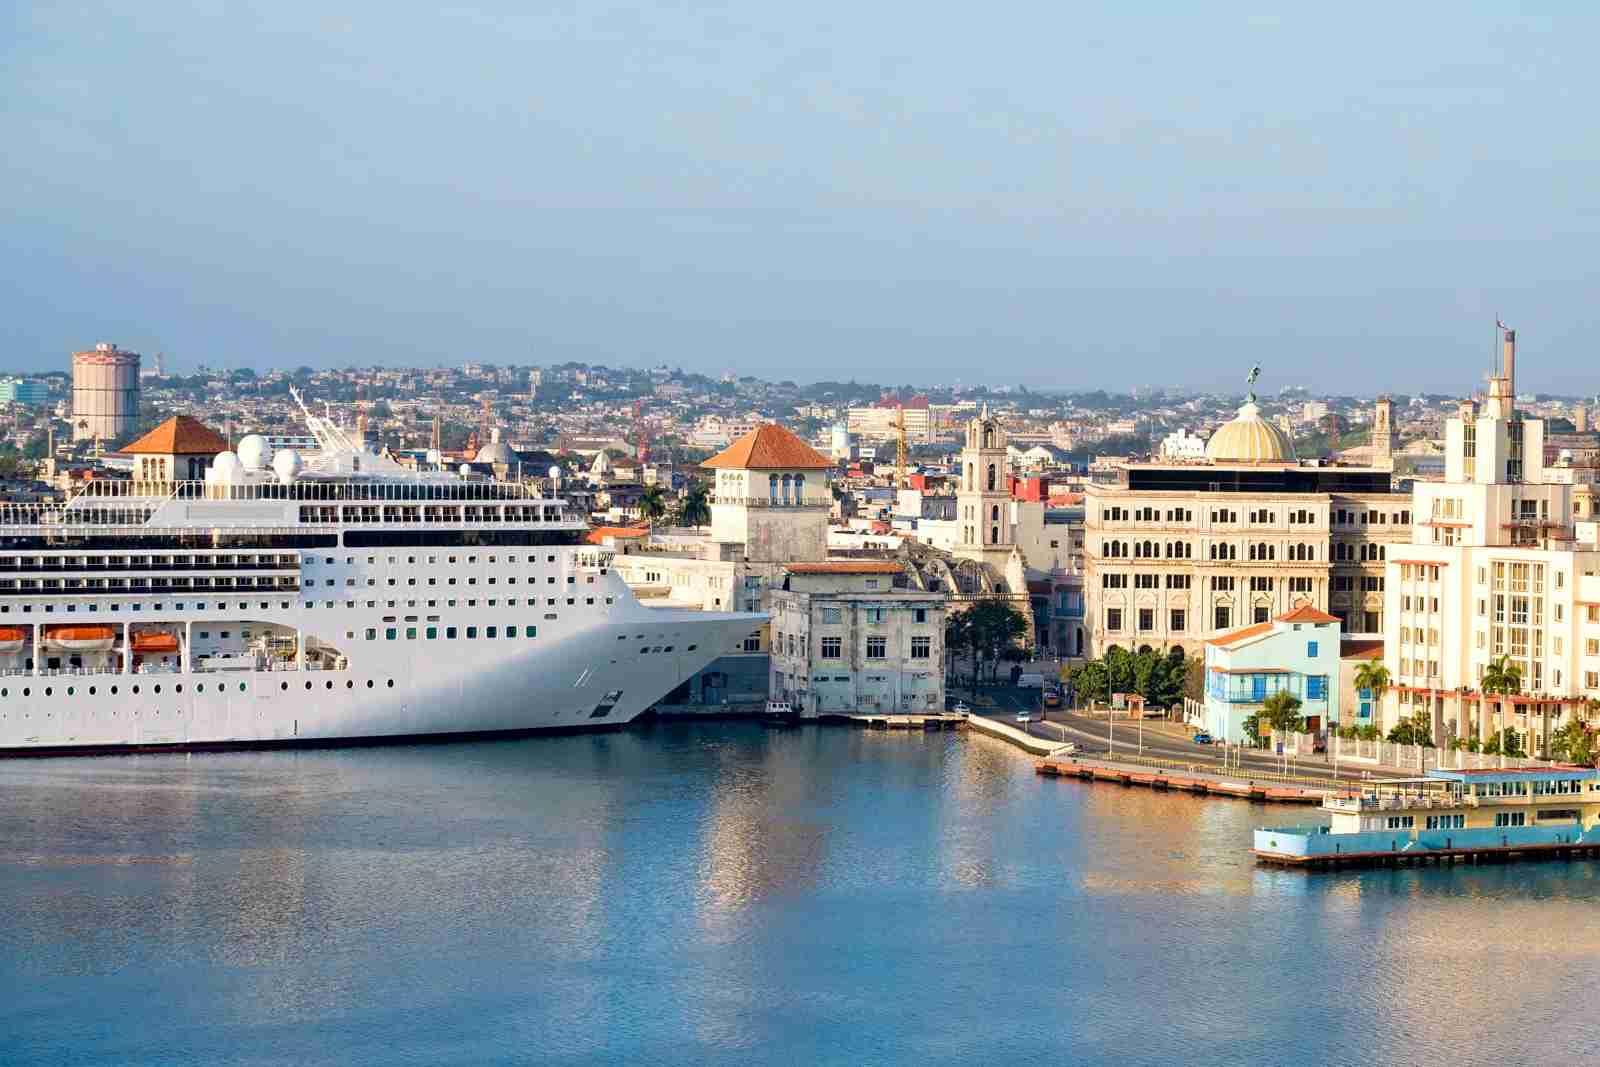 Cuba Cruise ship docked in Havana